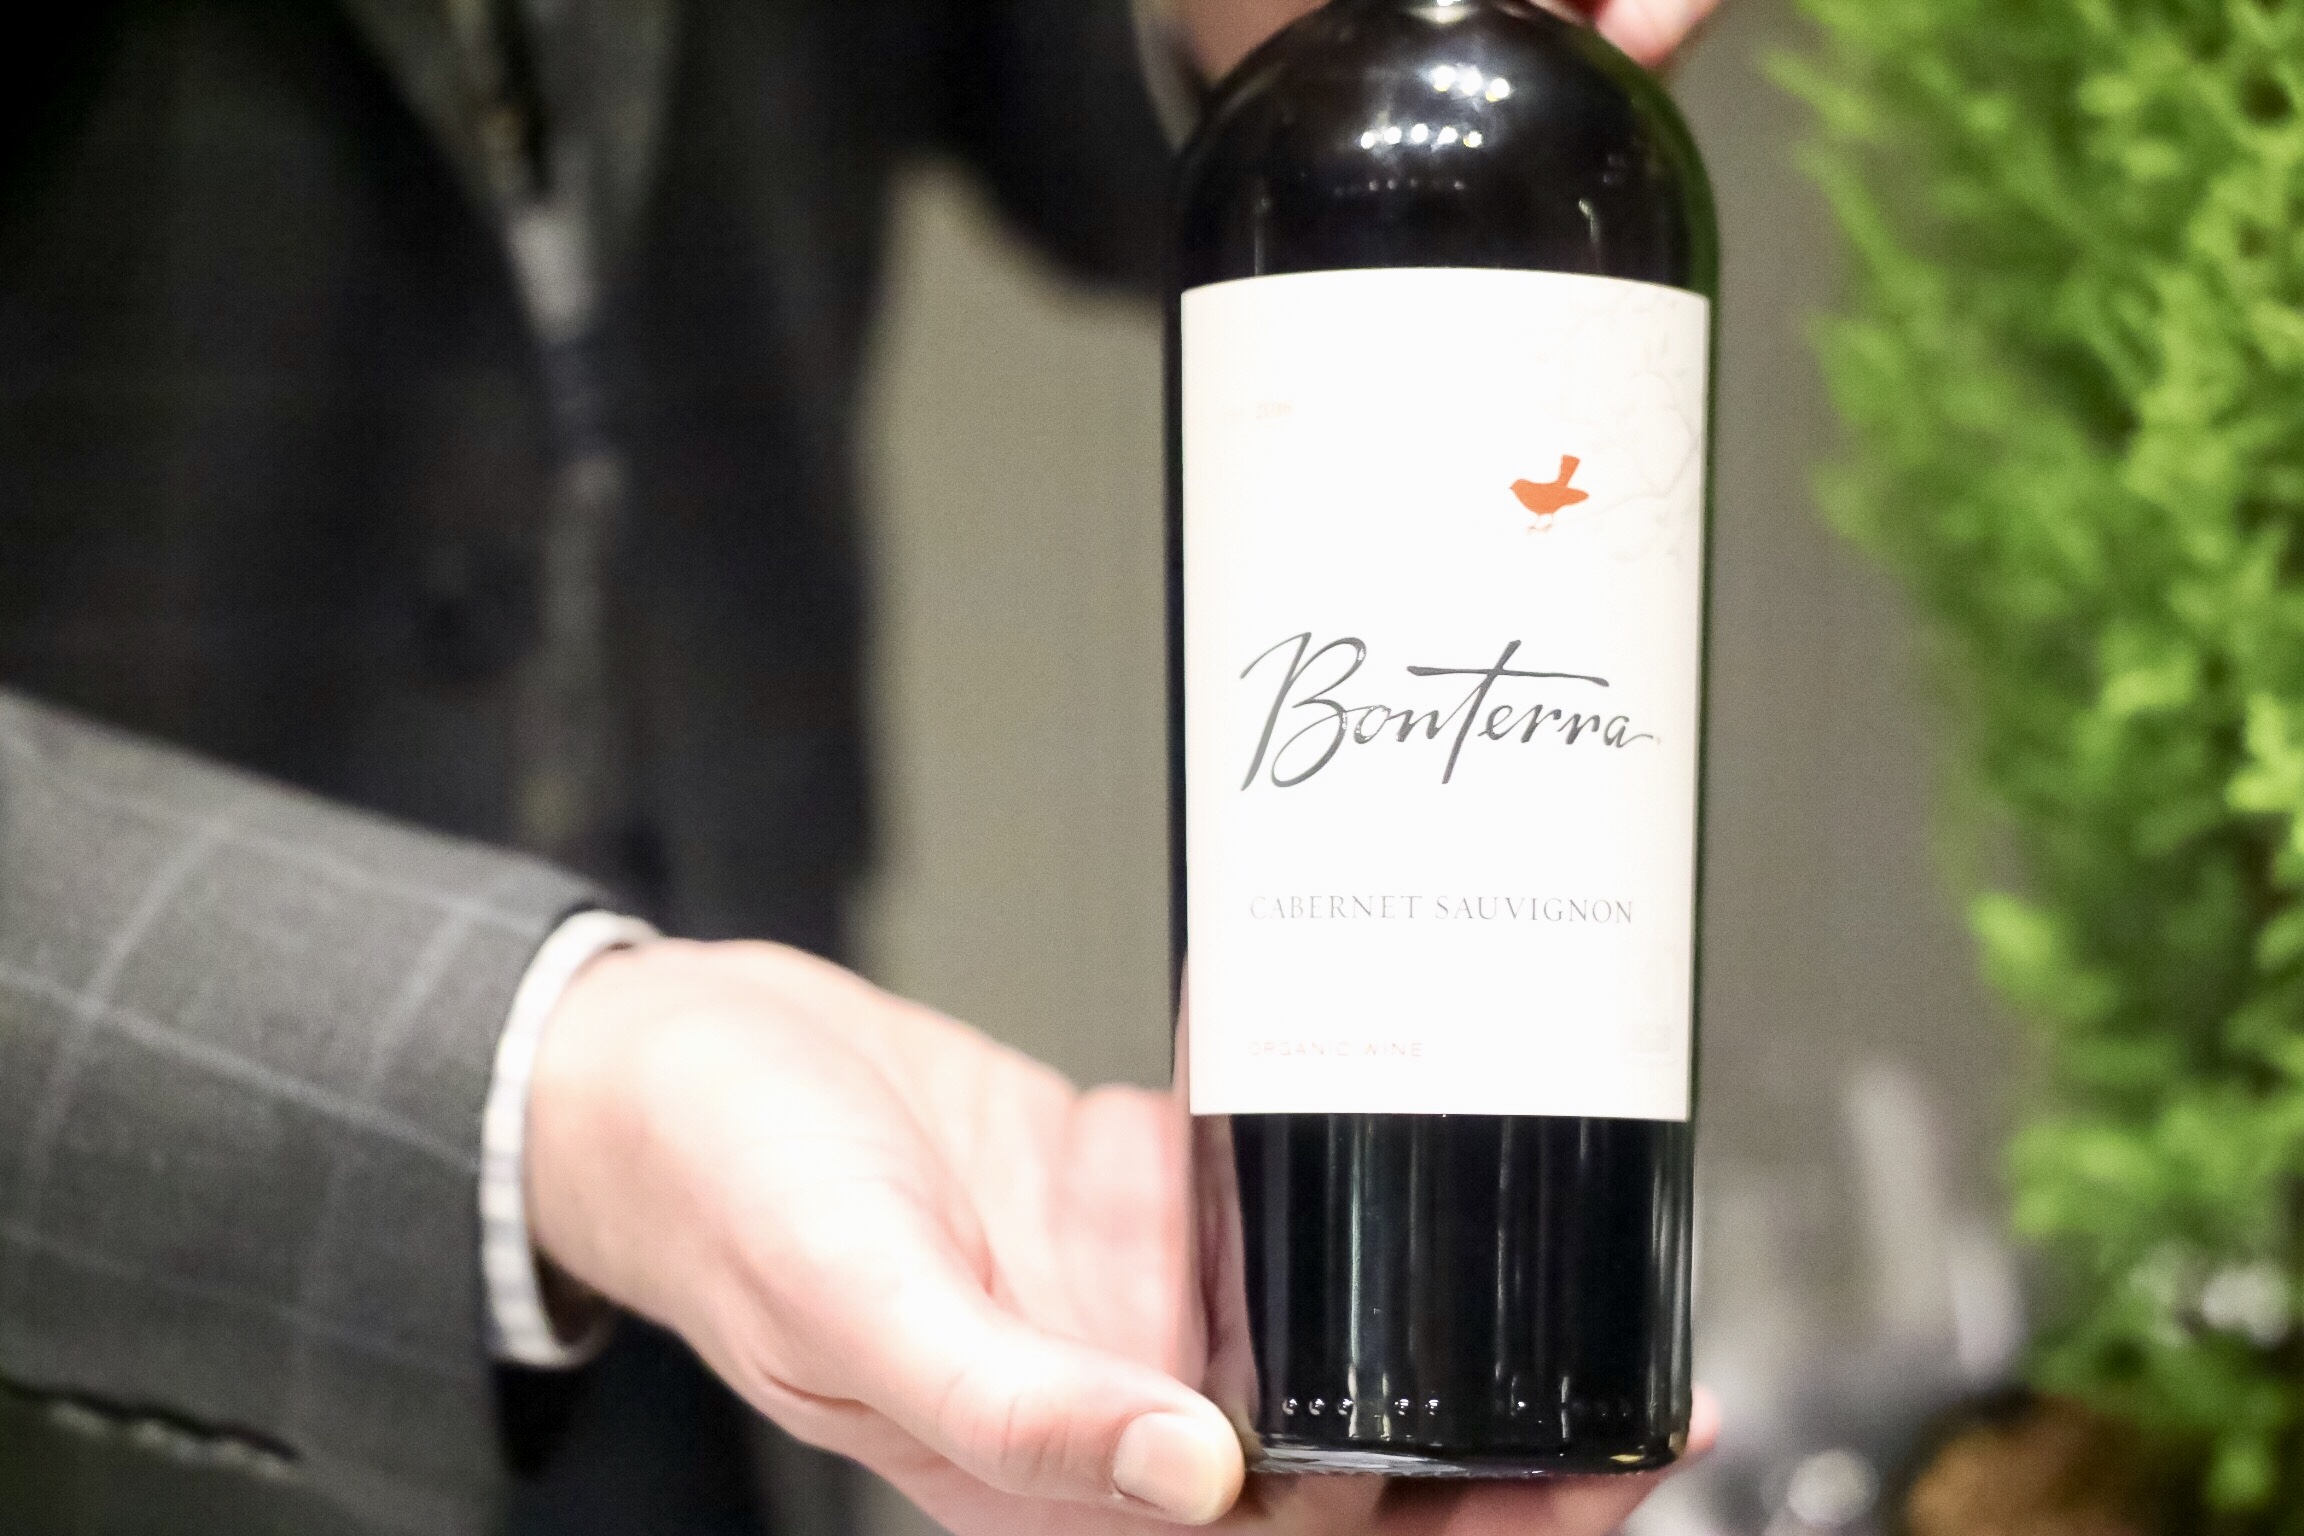 Bonterra Organic Cabernet Sauvignon 2016